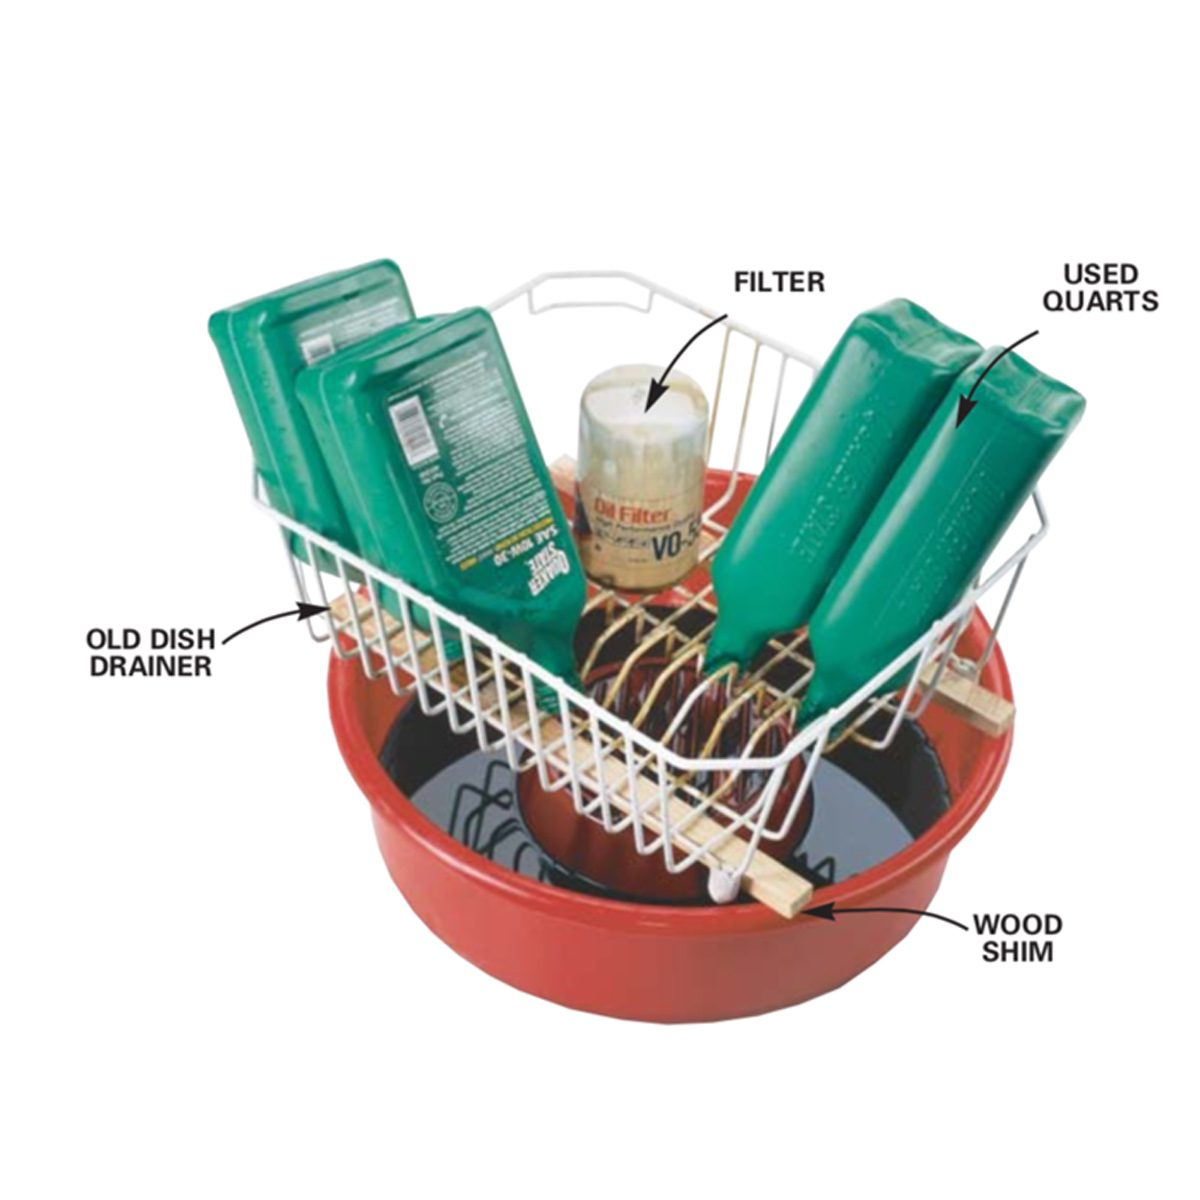 Oil drain basket